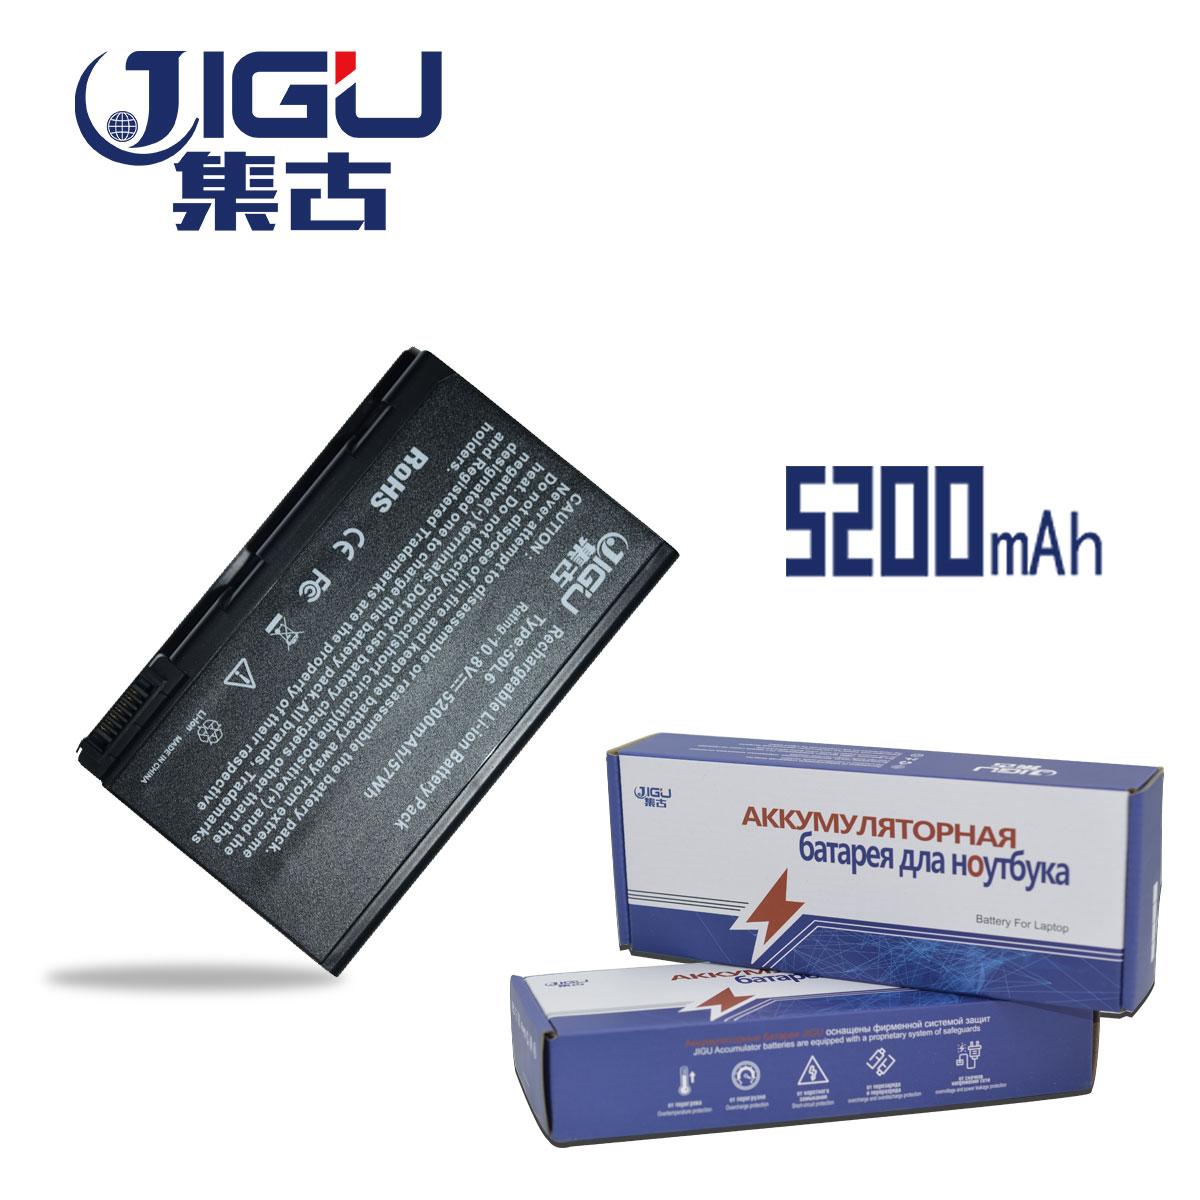 Bateria do laptopa jigu dla Acer Aspire 5650 9110 9120 3100 3690 5100 5610 5630 5680 BATBL50L6 BATBL50L8H